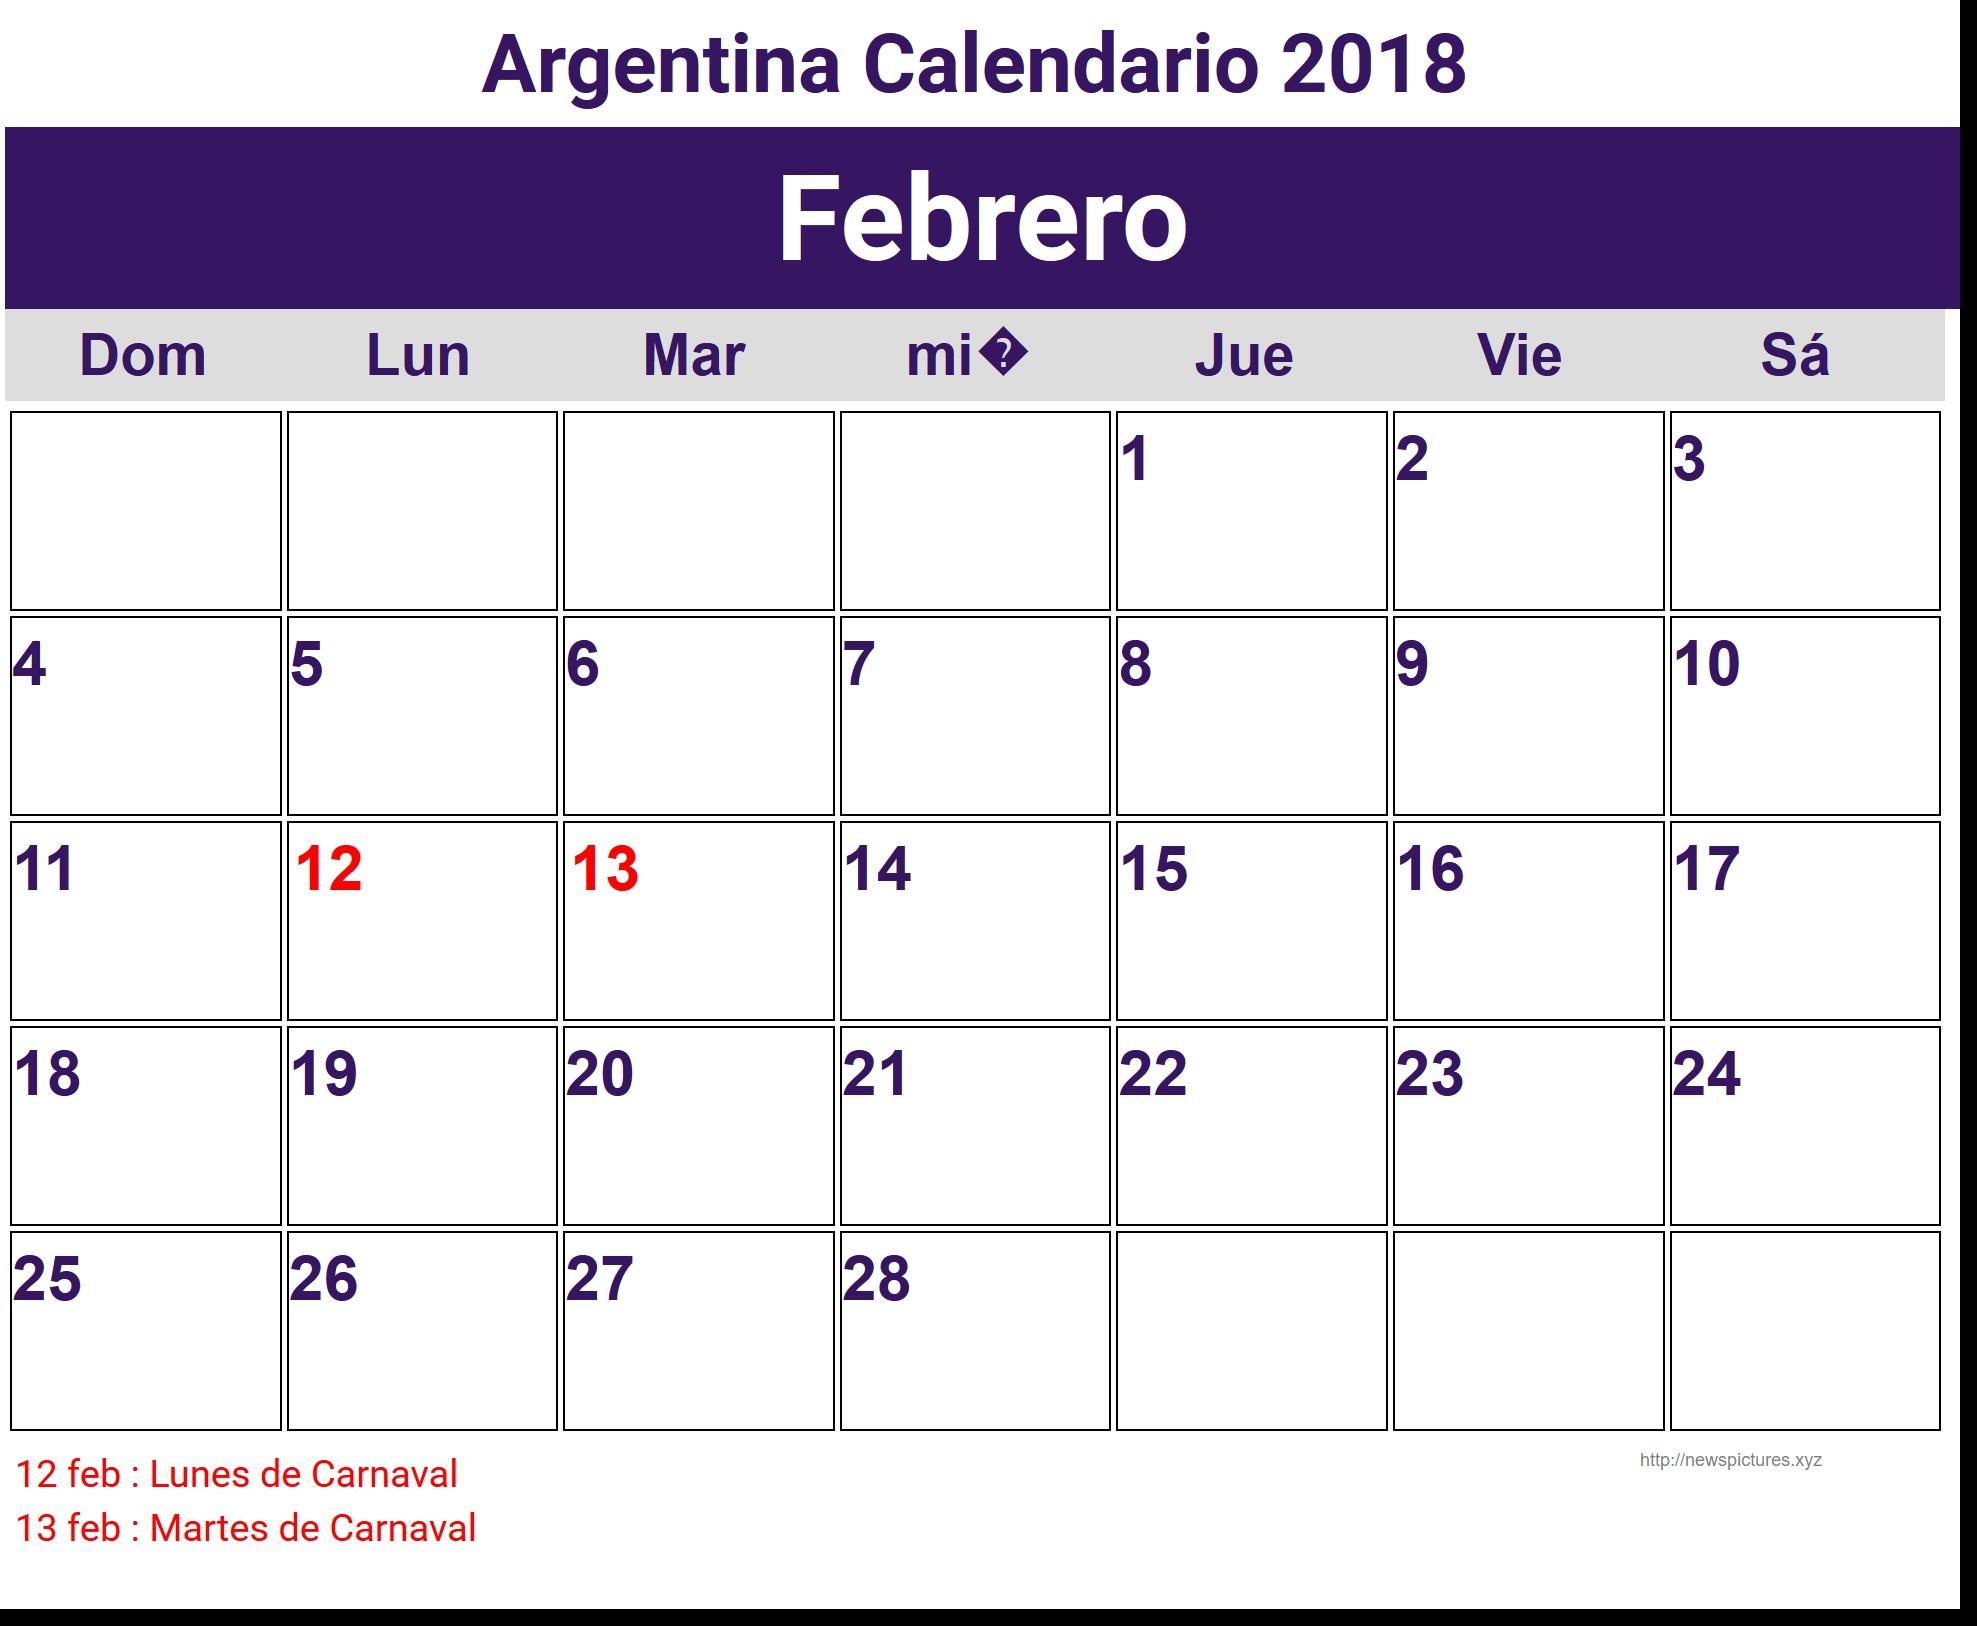 Calendario 2019 Con Festivos Chile Más Reciente Image for Febrero Argentina Calendario 2018 Of Calendario 2019 Con Festivos Chile Más Recientemente Liberado Medios Calendario 2016 Para Imprimir Con Feriados Chile